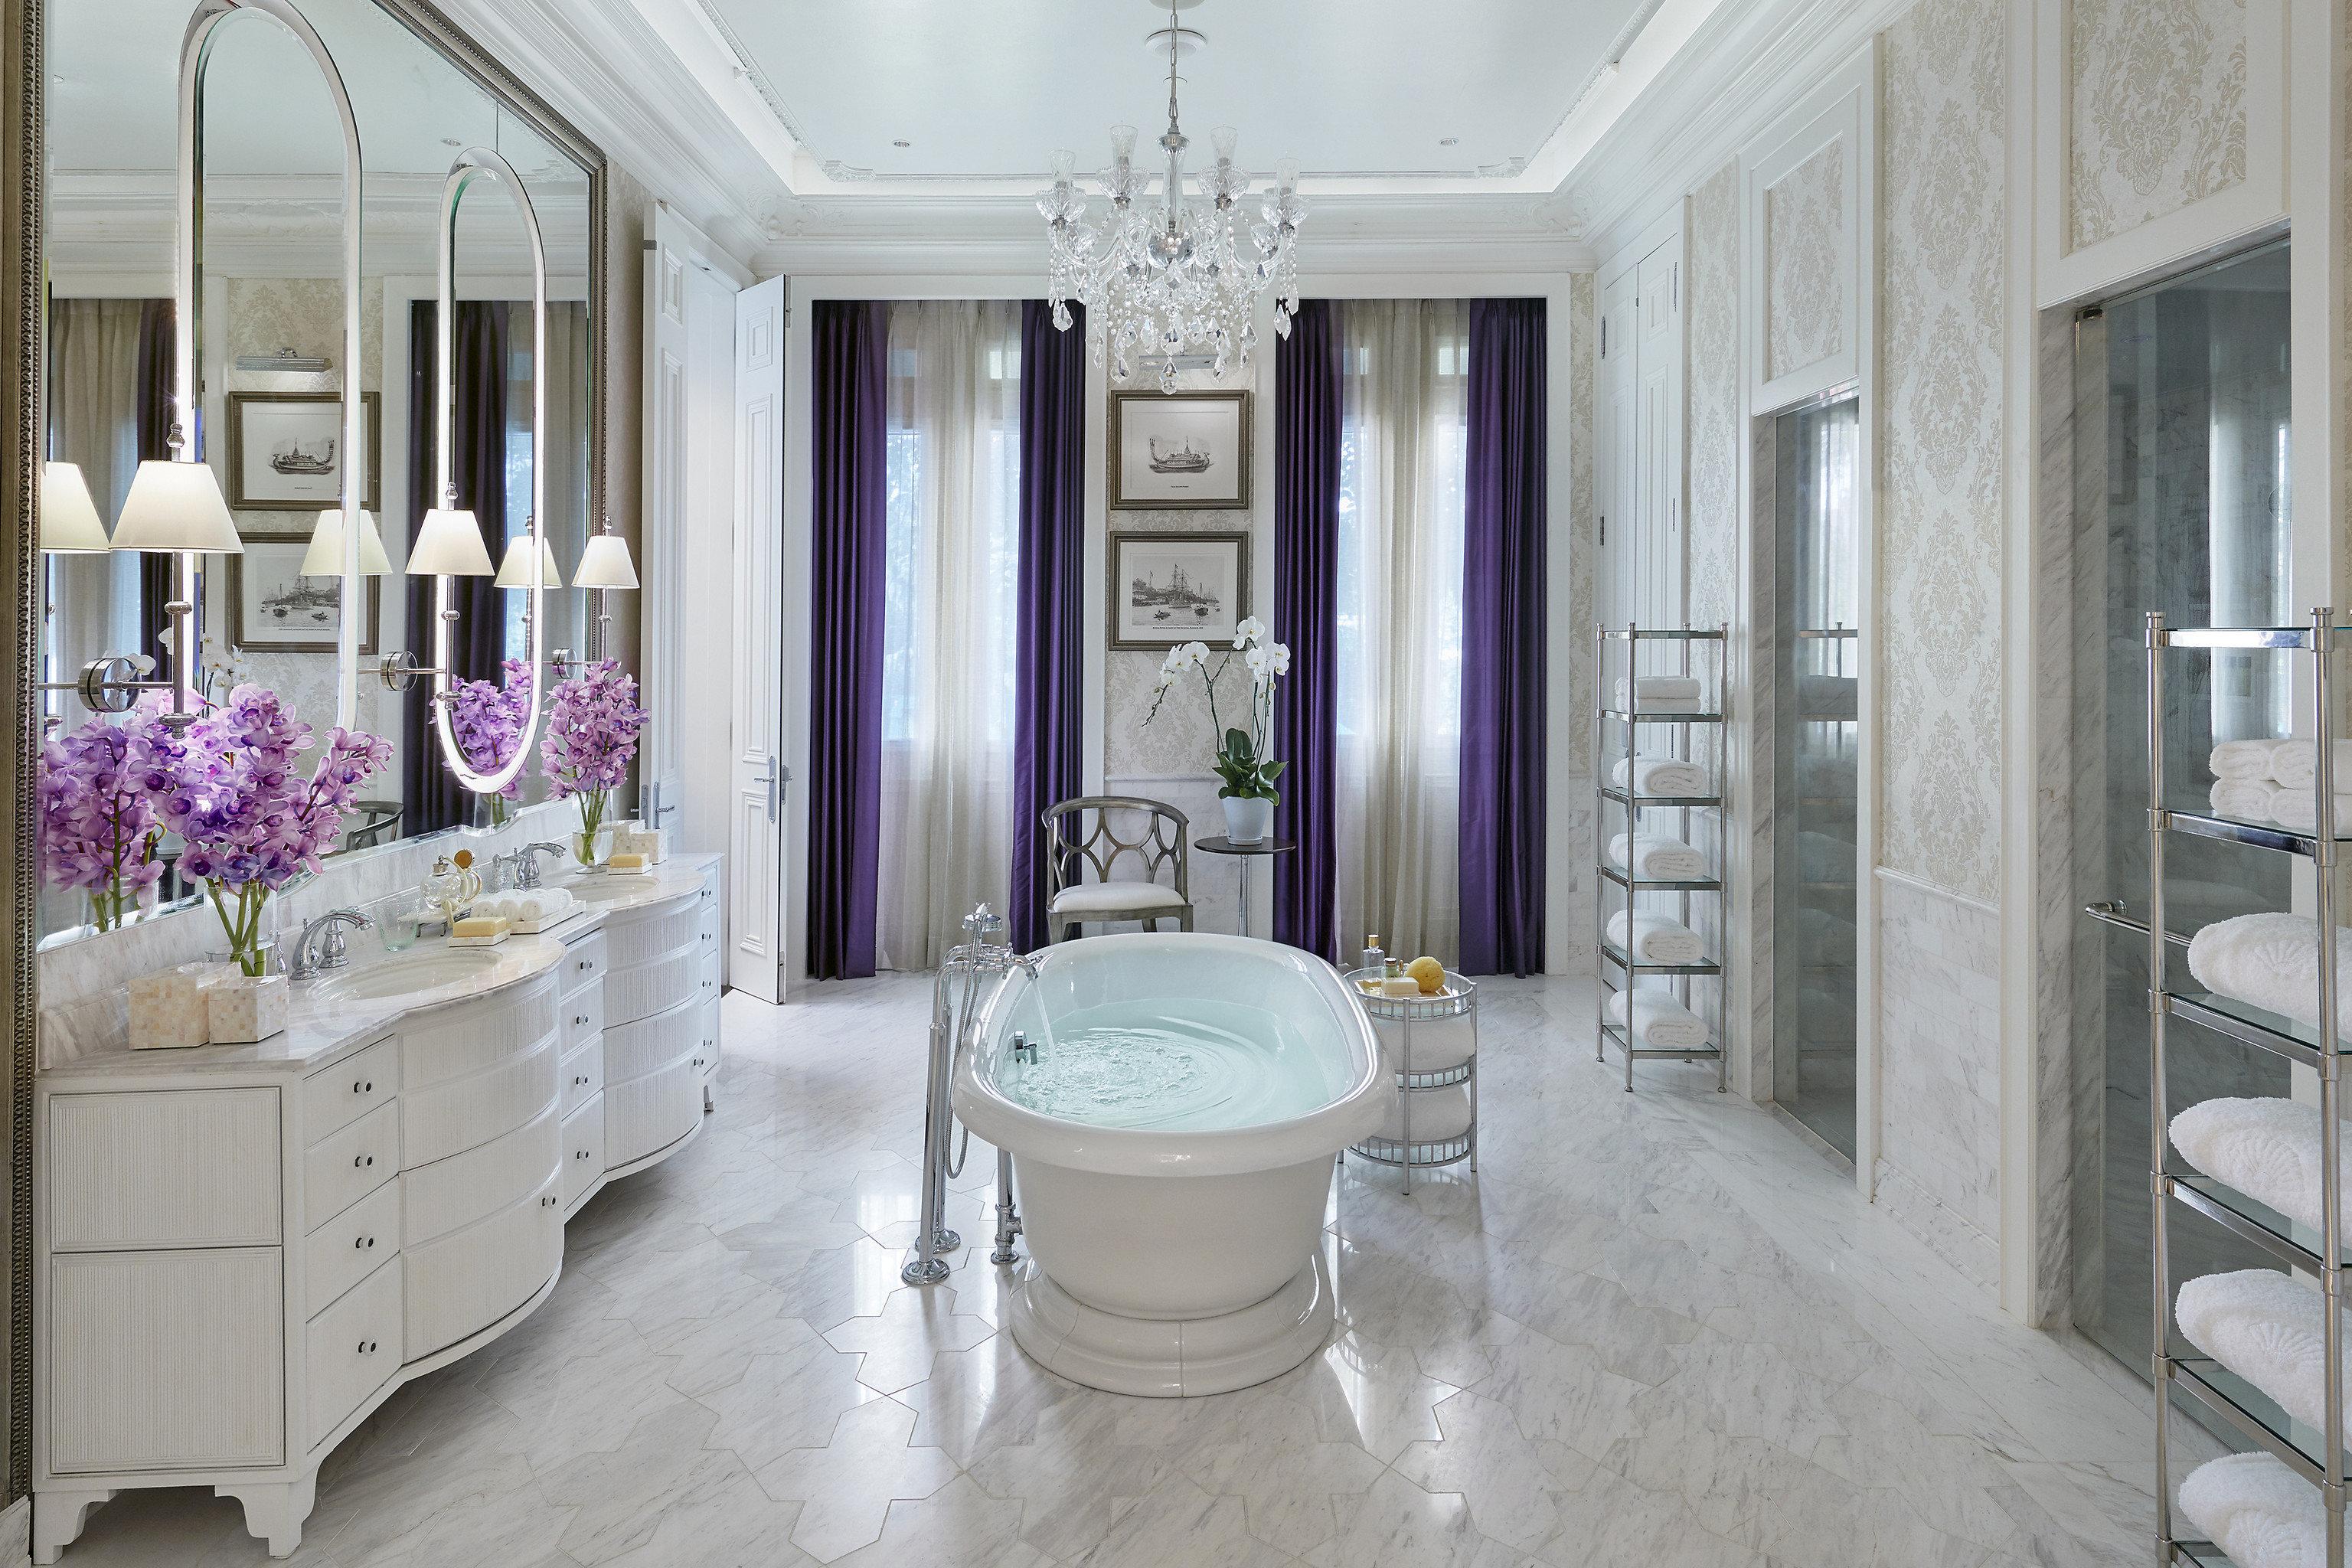 Hotels indoor room property bathroom estate home floor mansion interior design Design hall flooring furniture decorated fancy